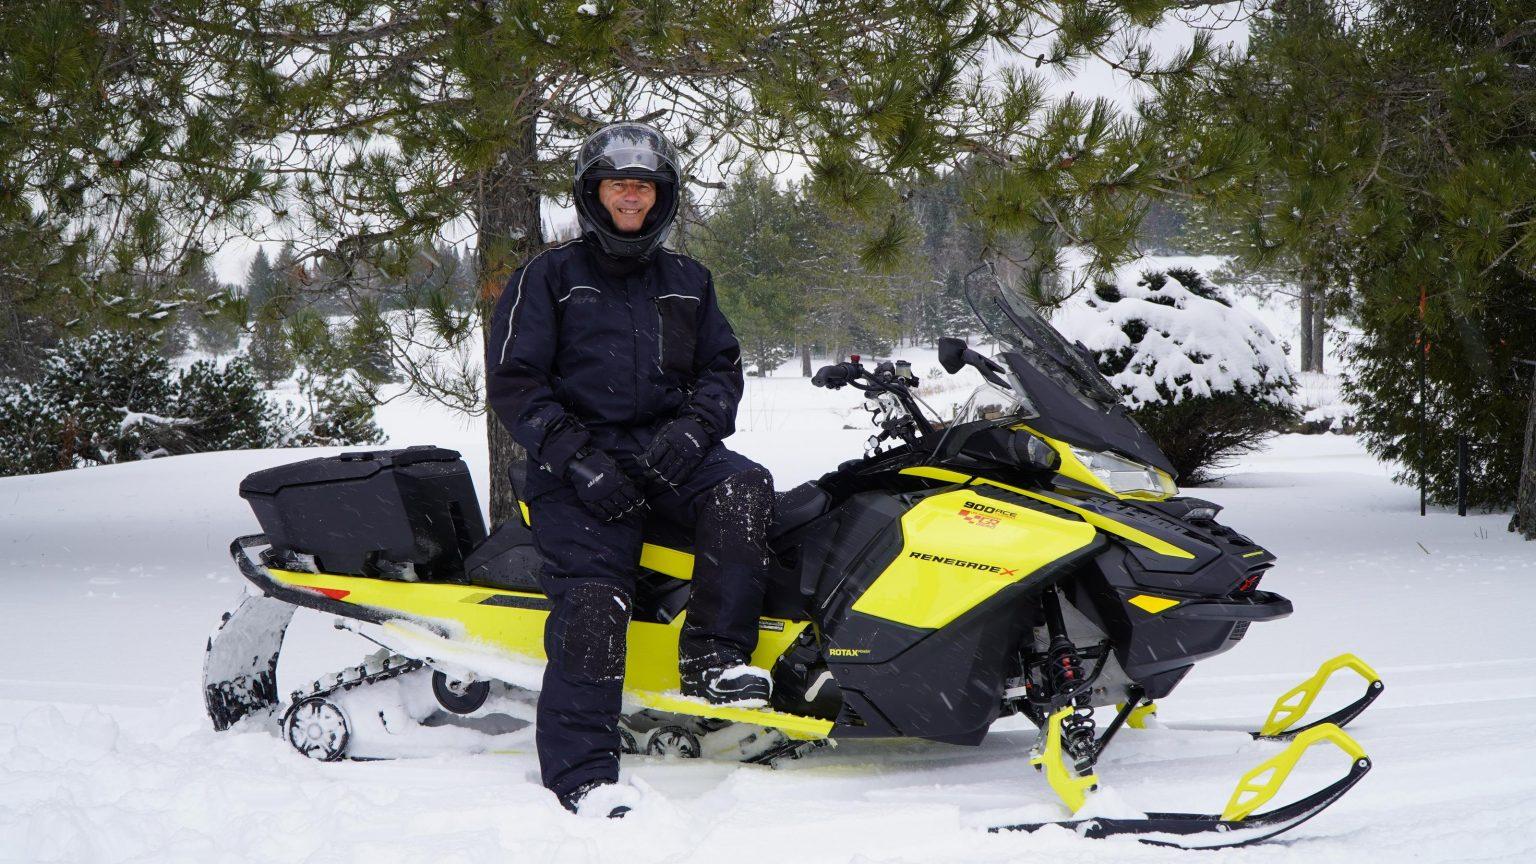 Ski-Doo Renegade X 900 ACE Turbo 2021 – Bilan de saison